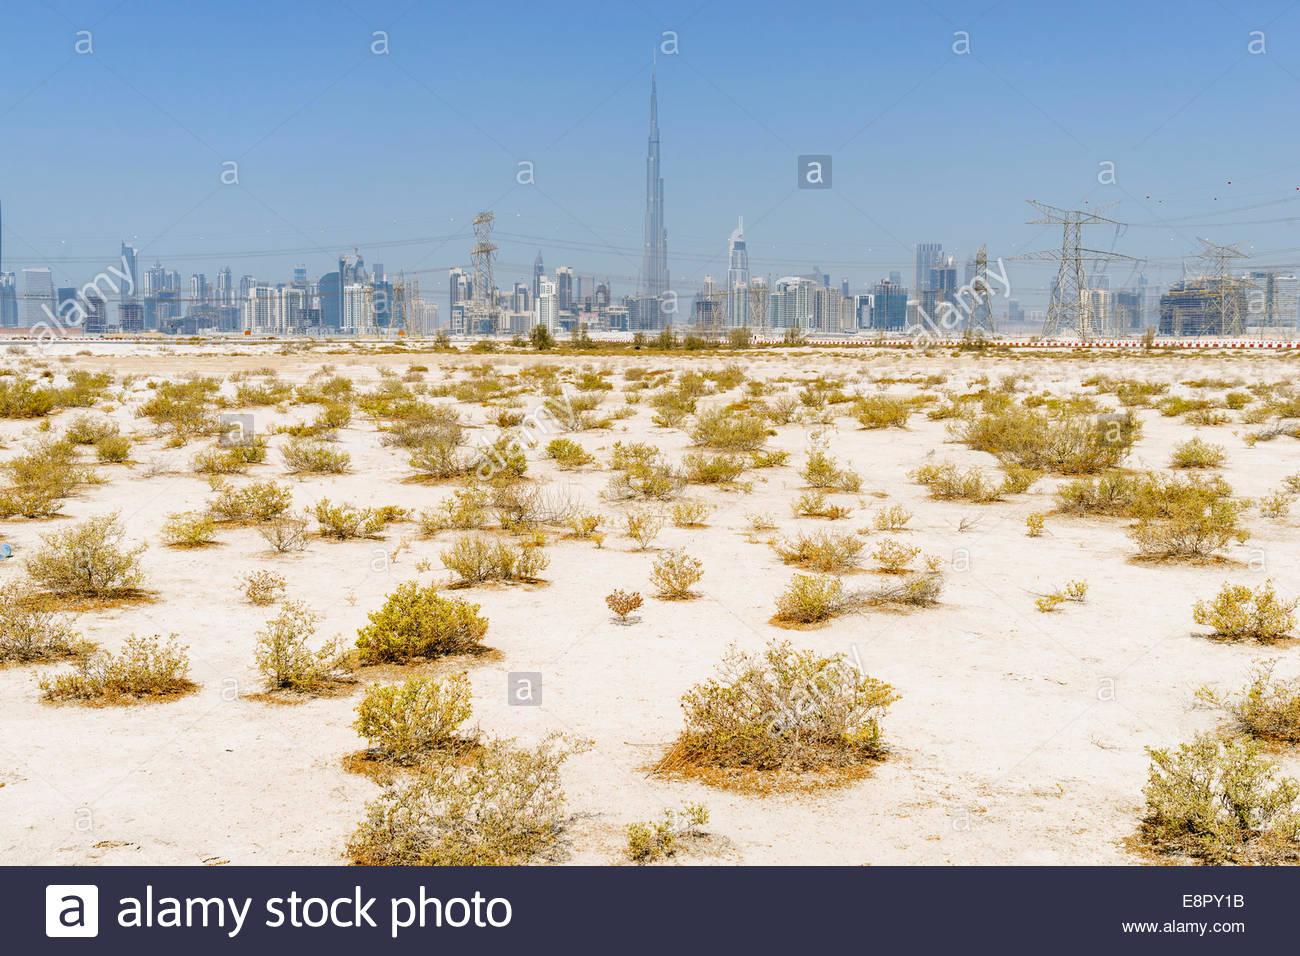 Skyline of skyscrapers and Burj Khalifa from the desert in Dubai United Arab Emirates - Stock Image